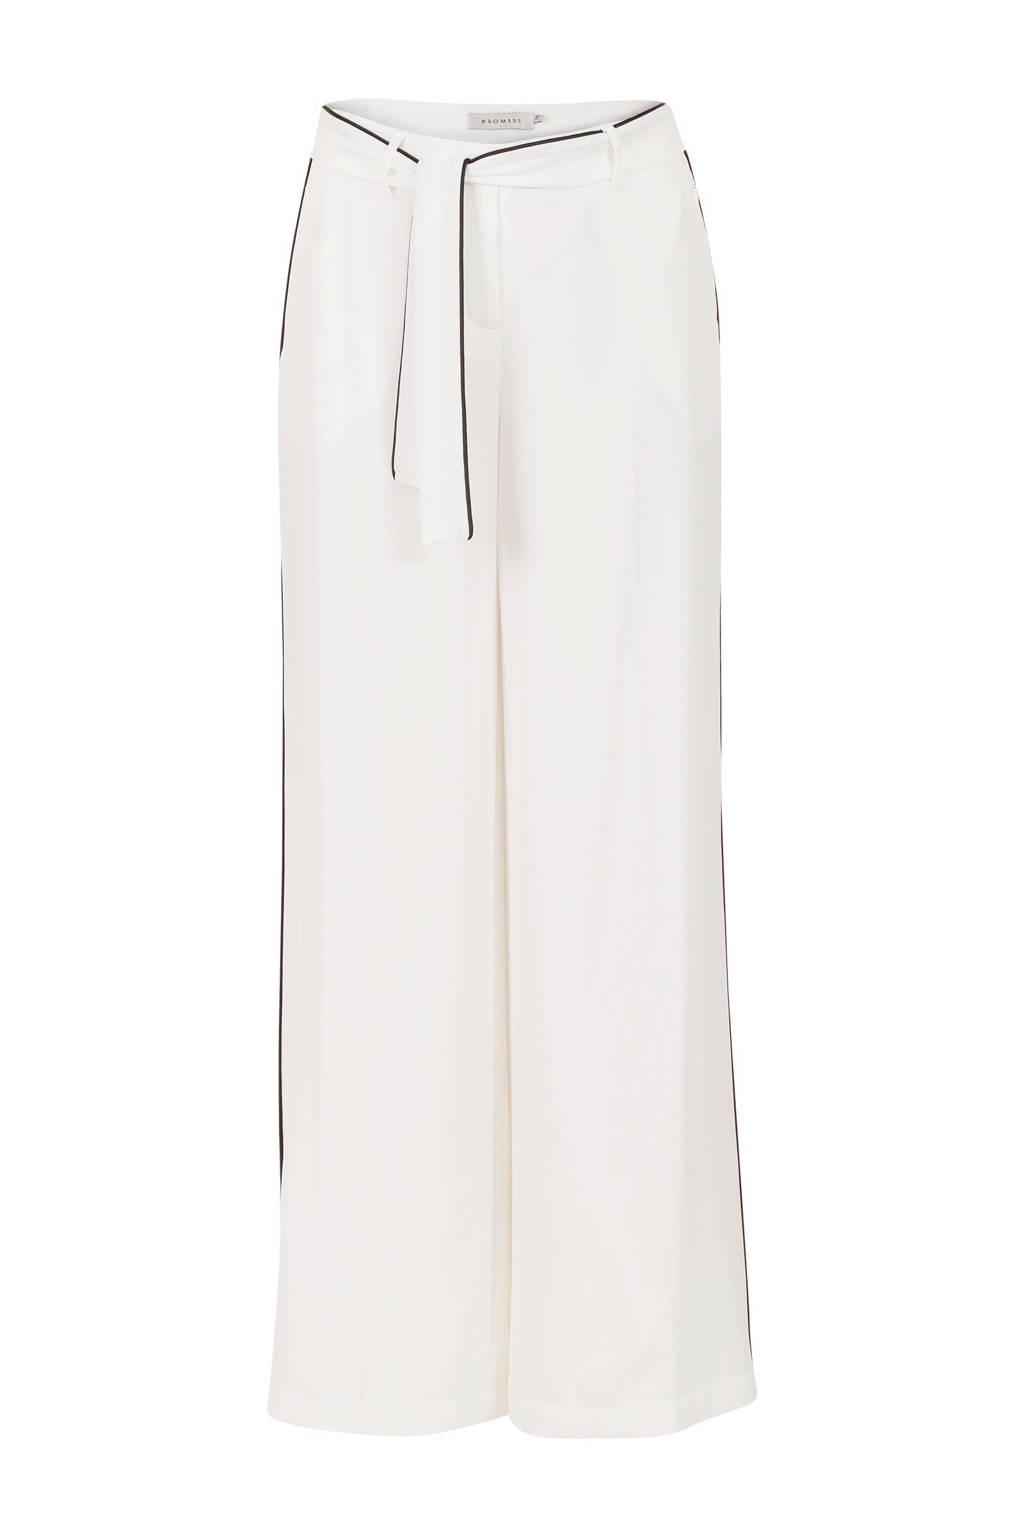 Promiss pantalon met zijstreep, Wit